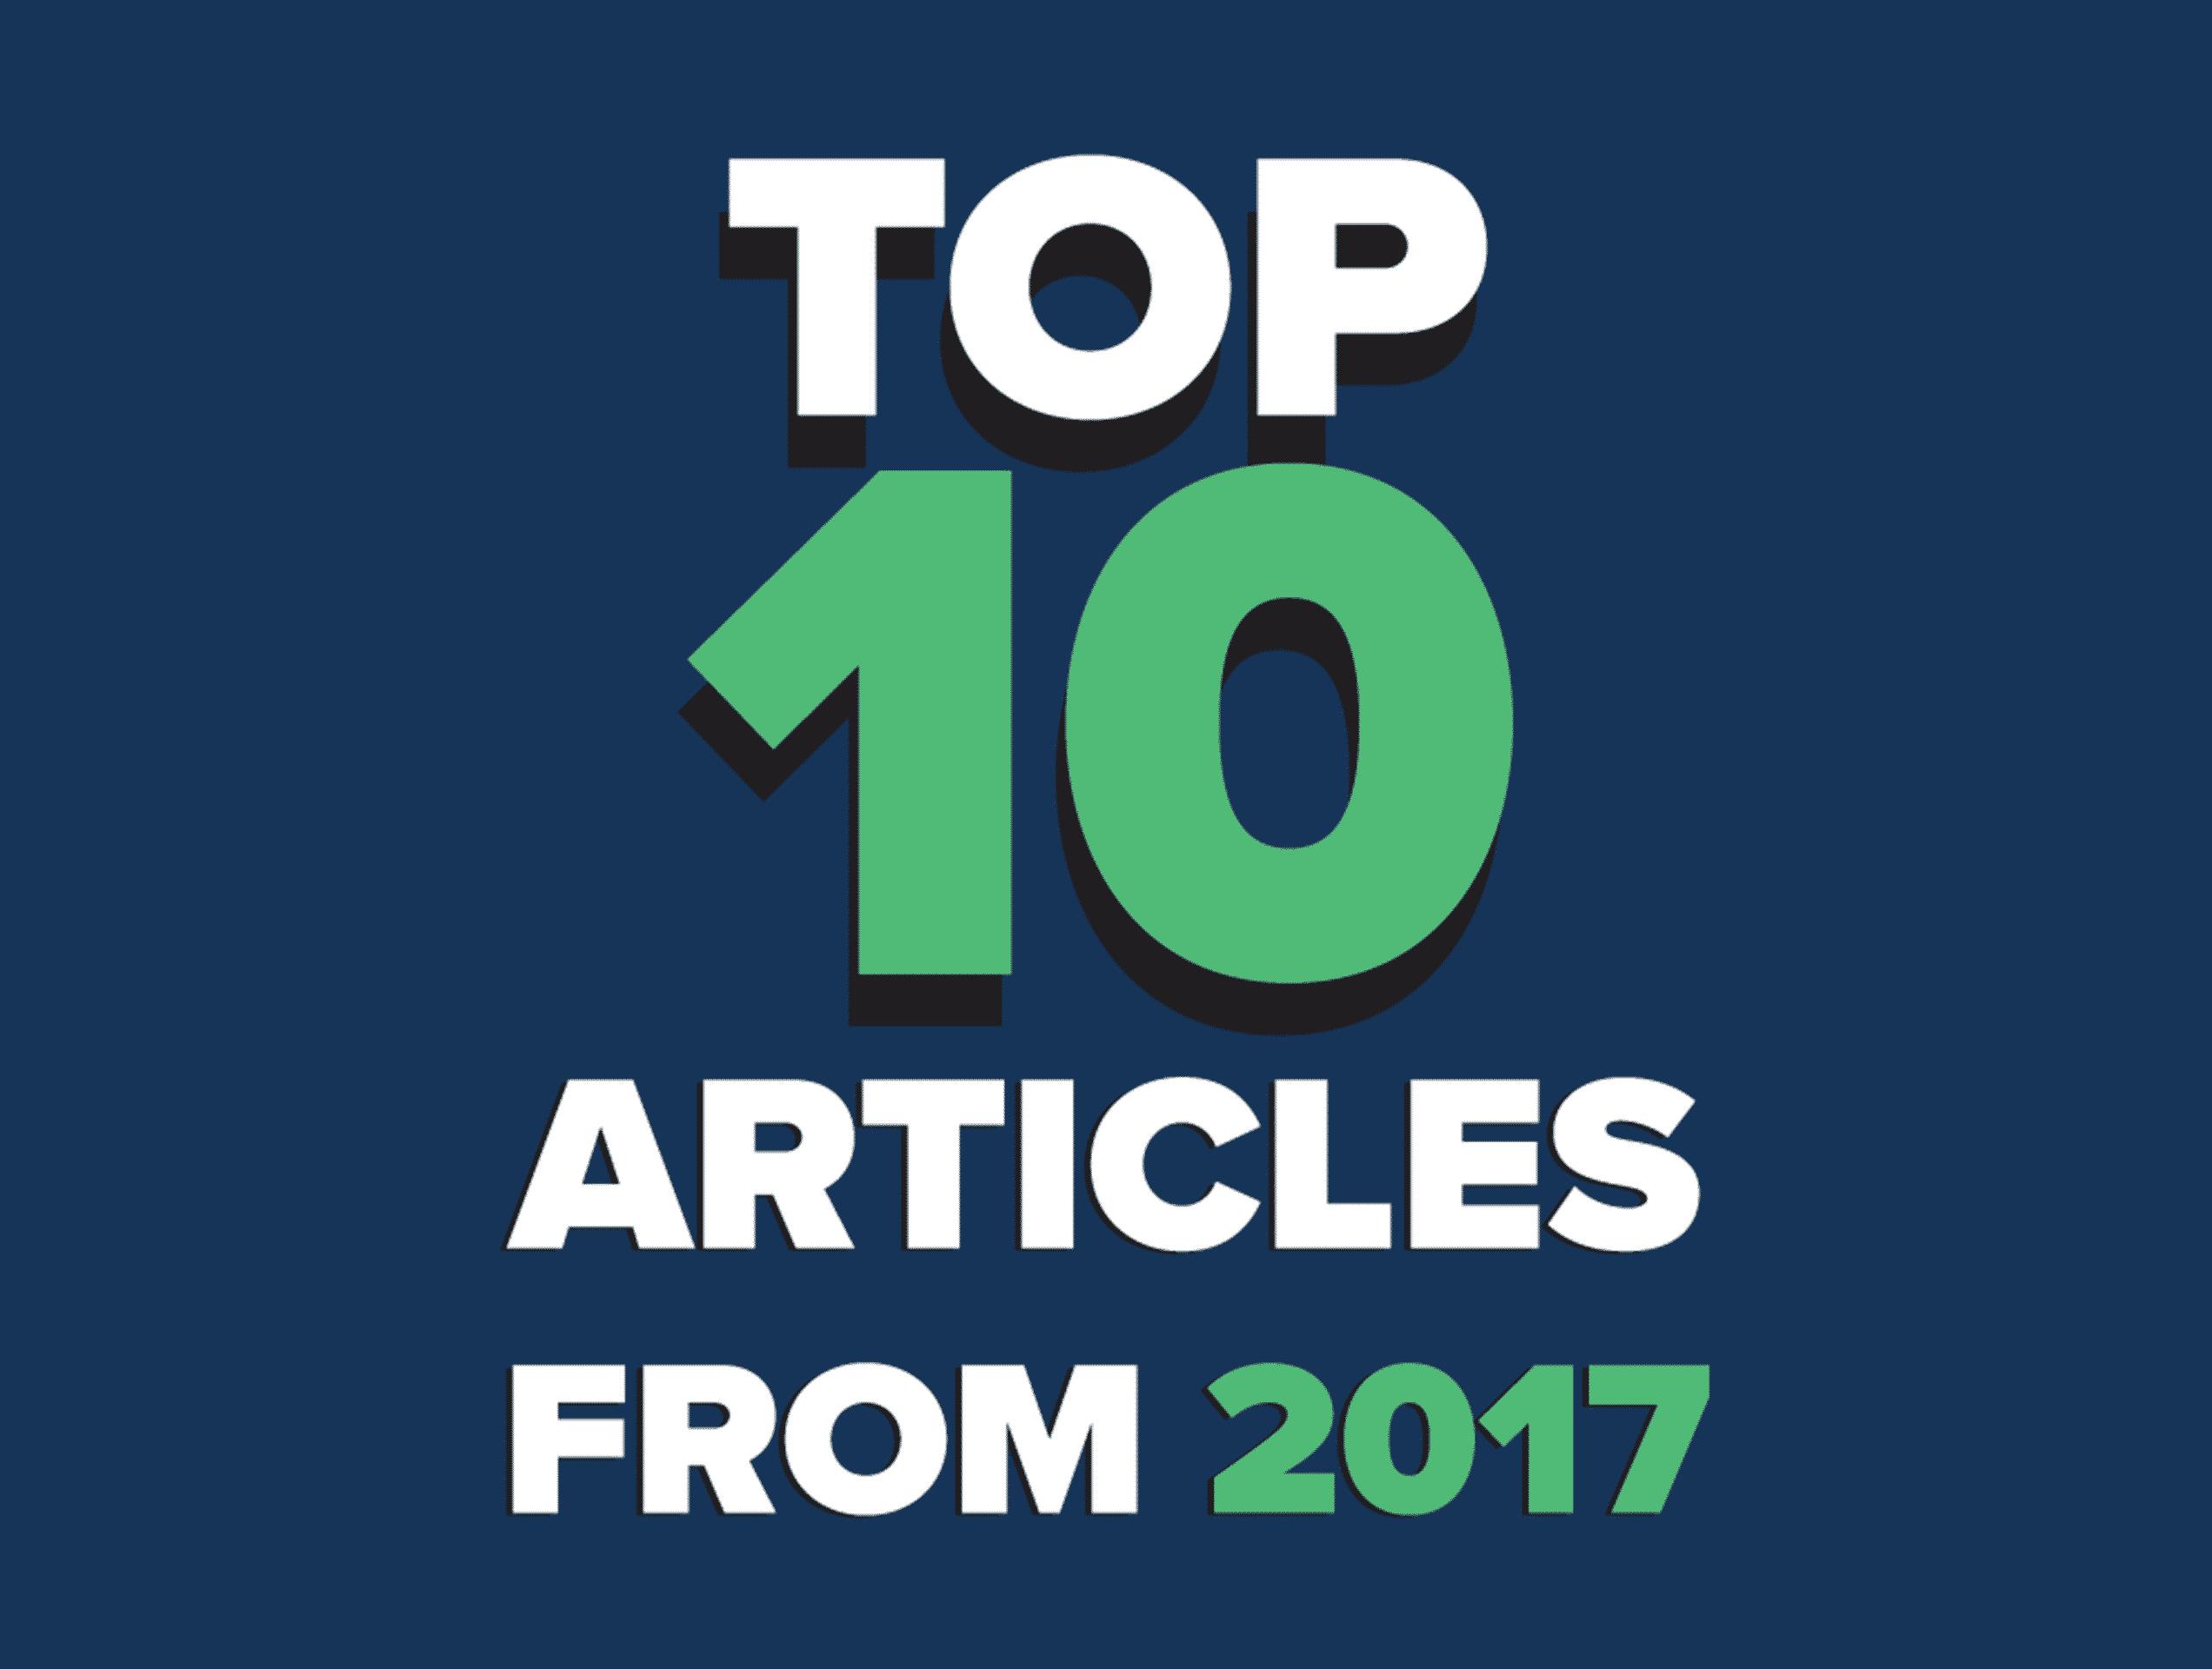 Top 10 Most Popular Articles of 2017